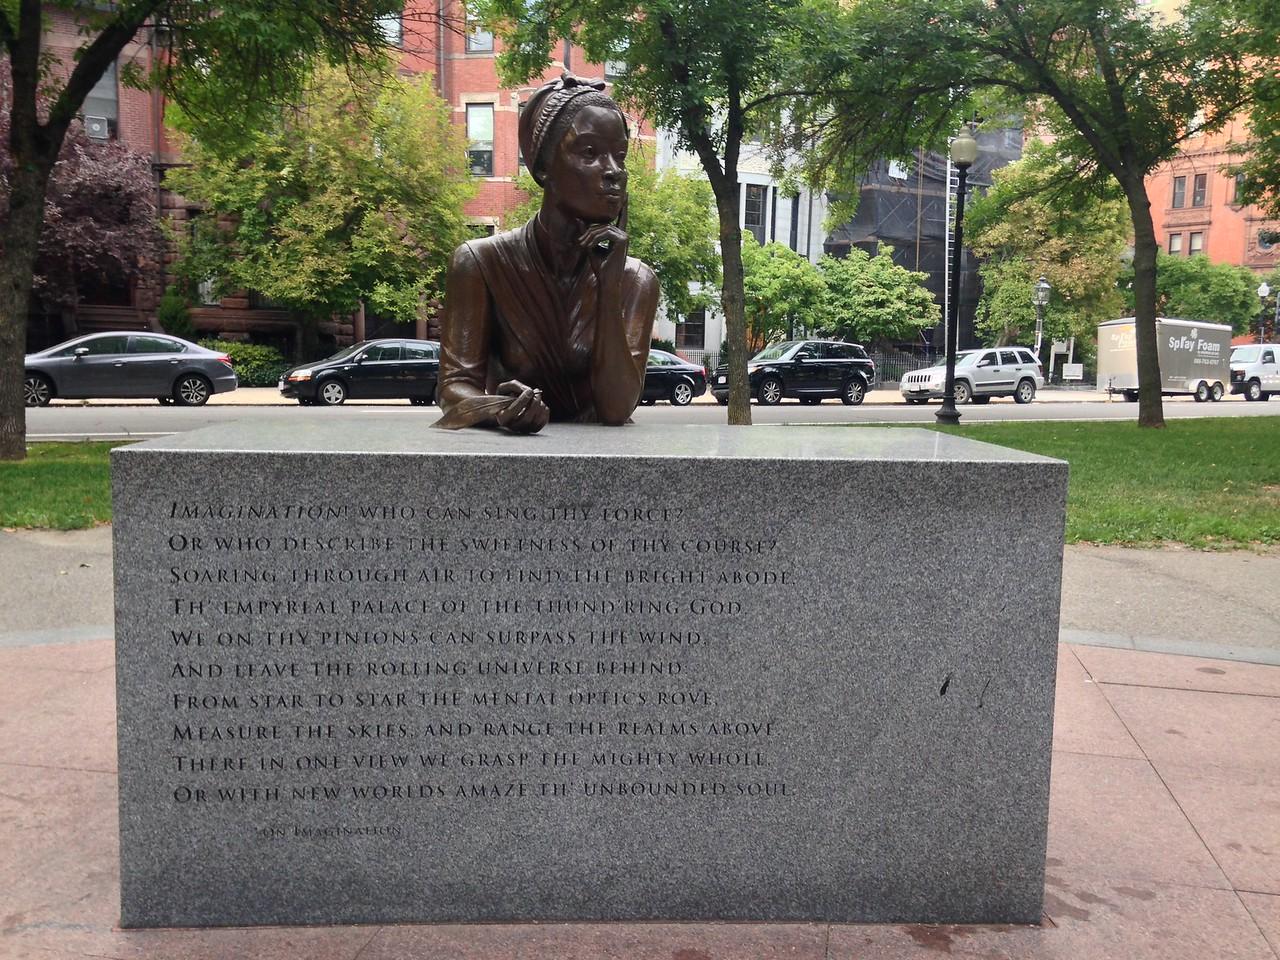 Sculpture of Phillis Wheatley at the Boston Women's Memorial.